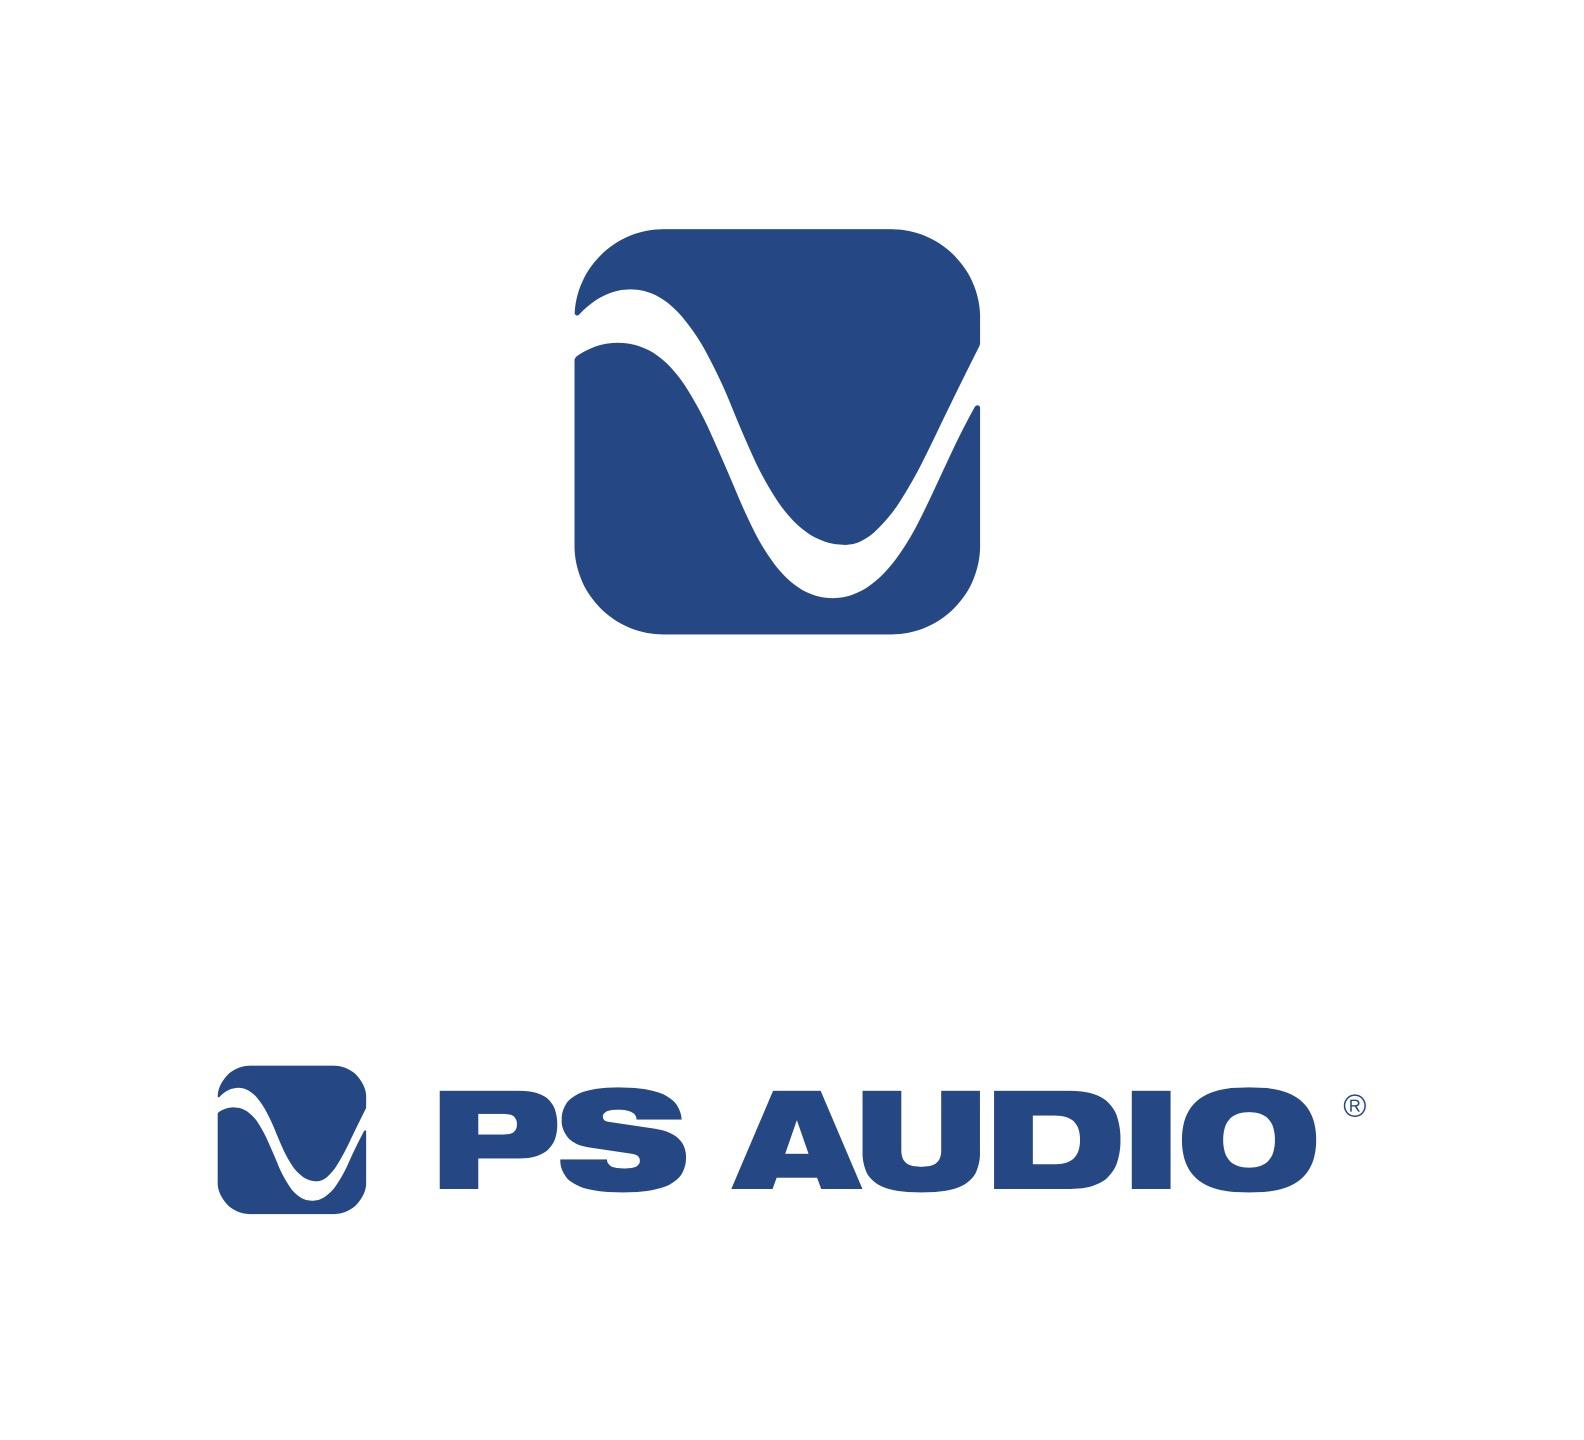 PS Audio New Logo Design